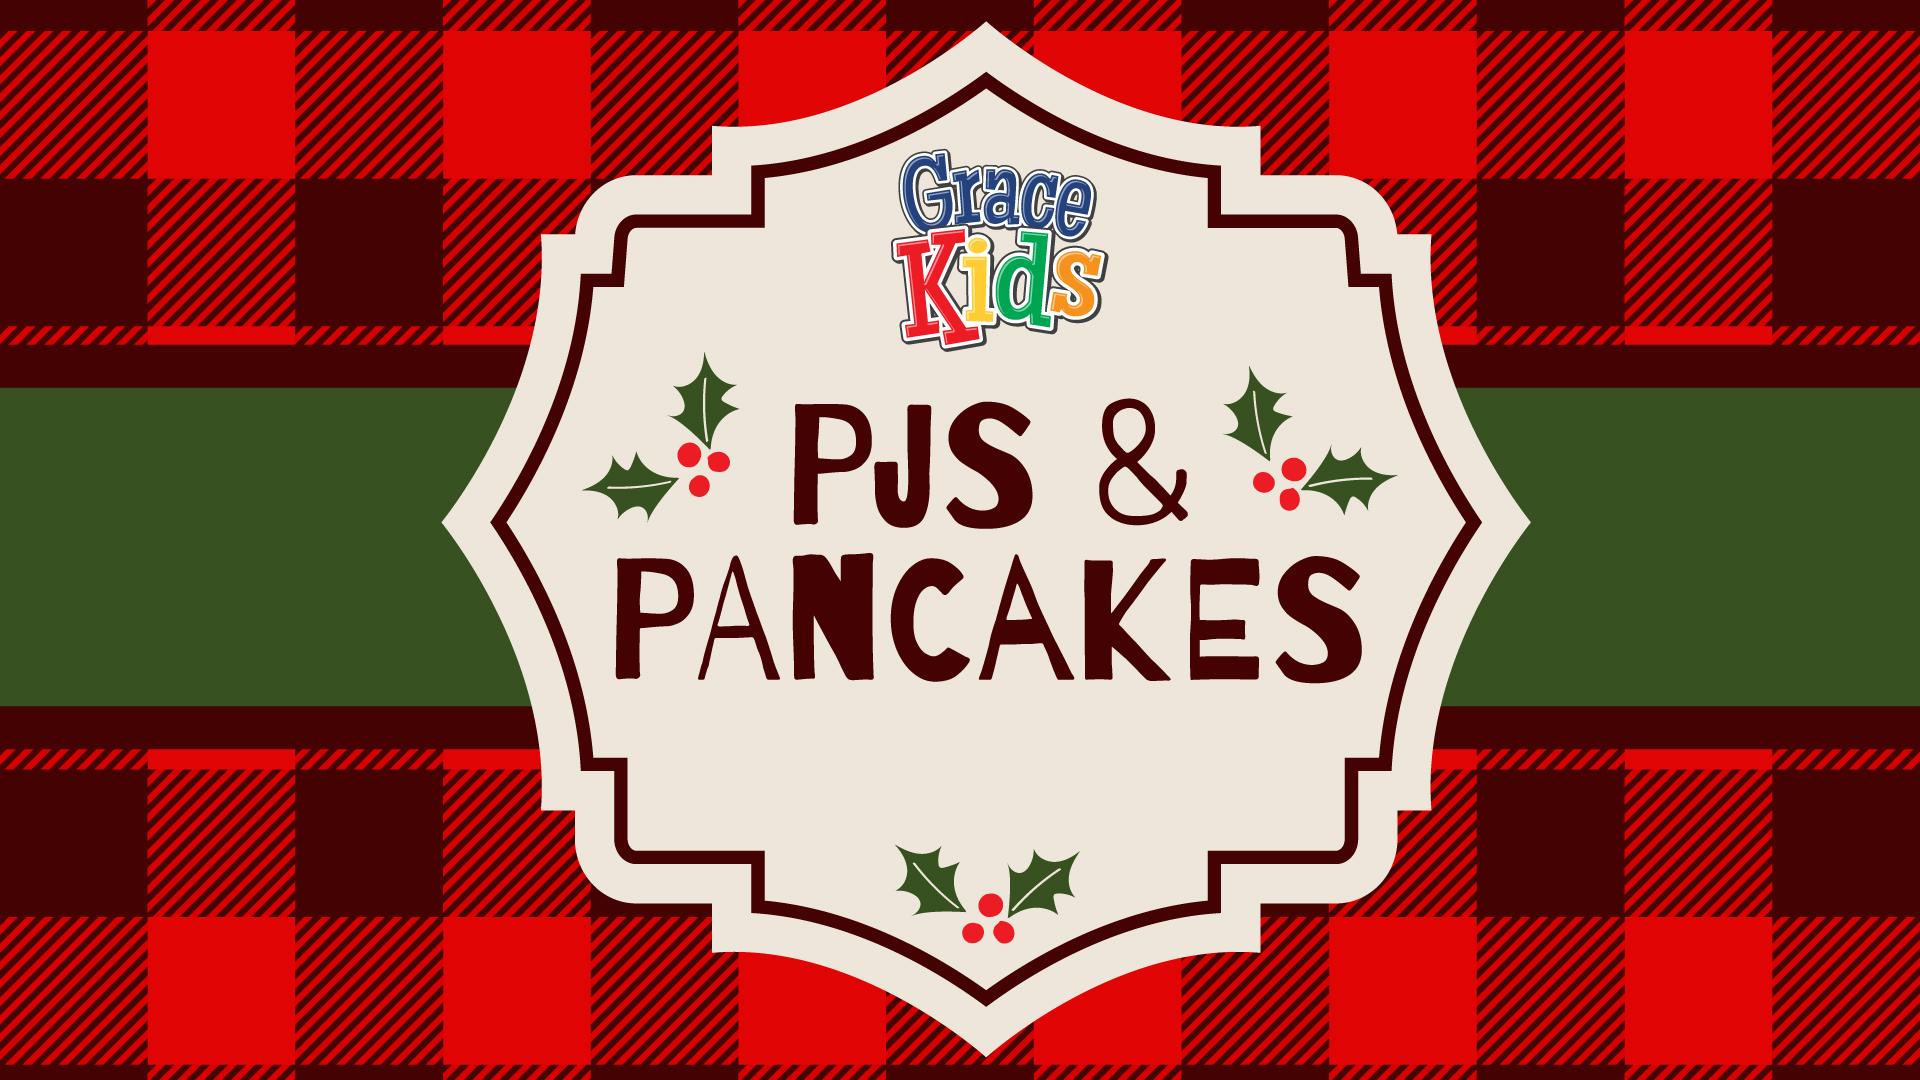 PJs-and-Pancakes_title.jpg